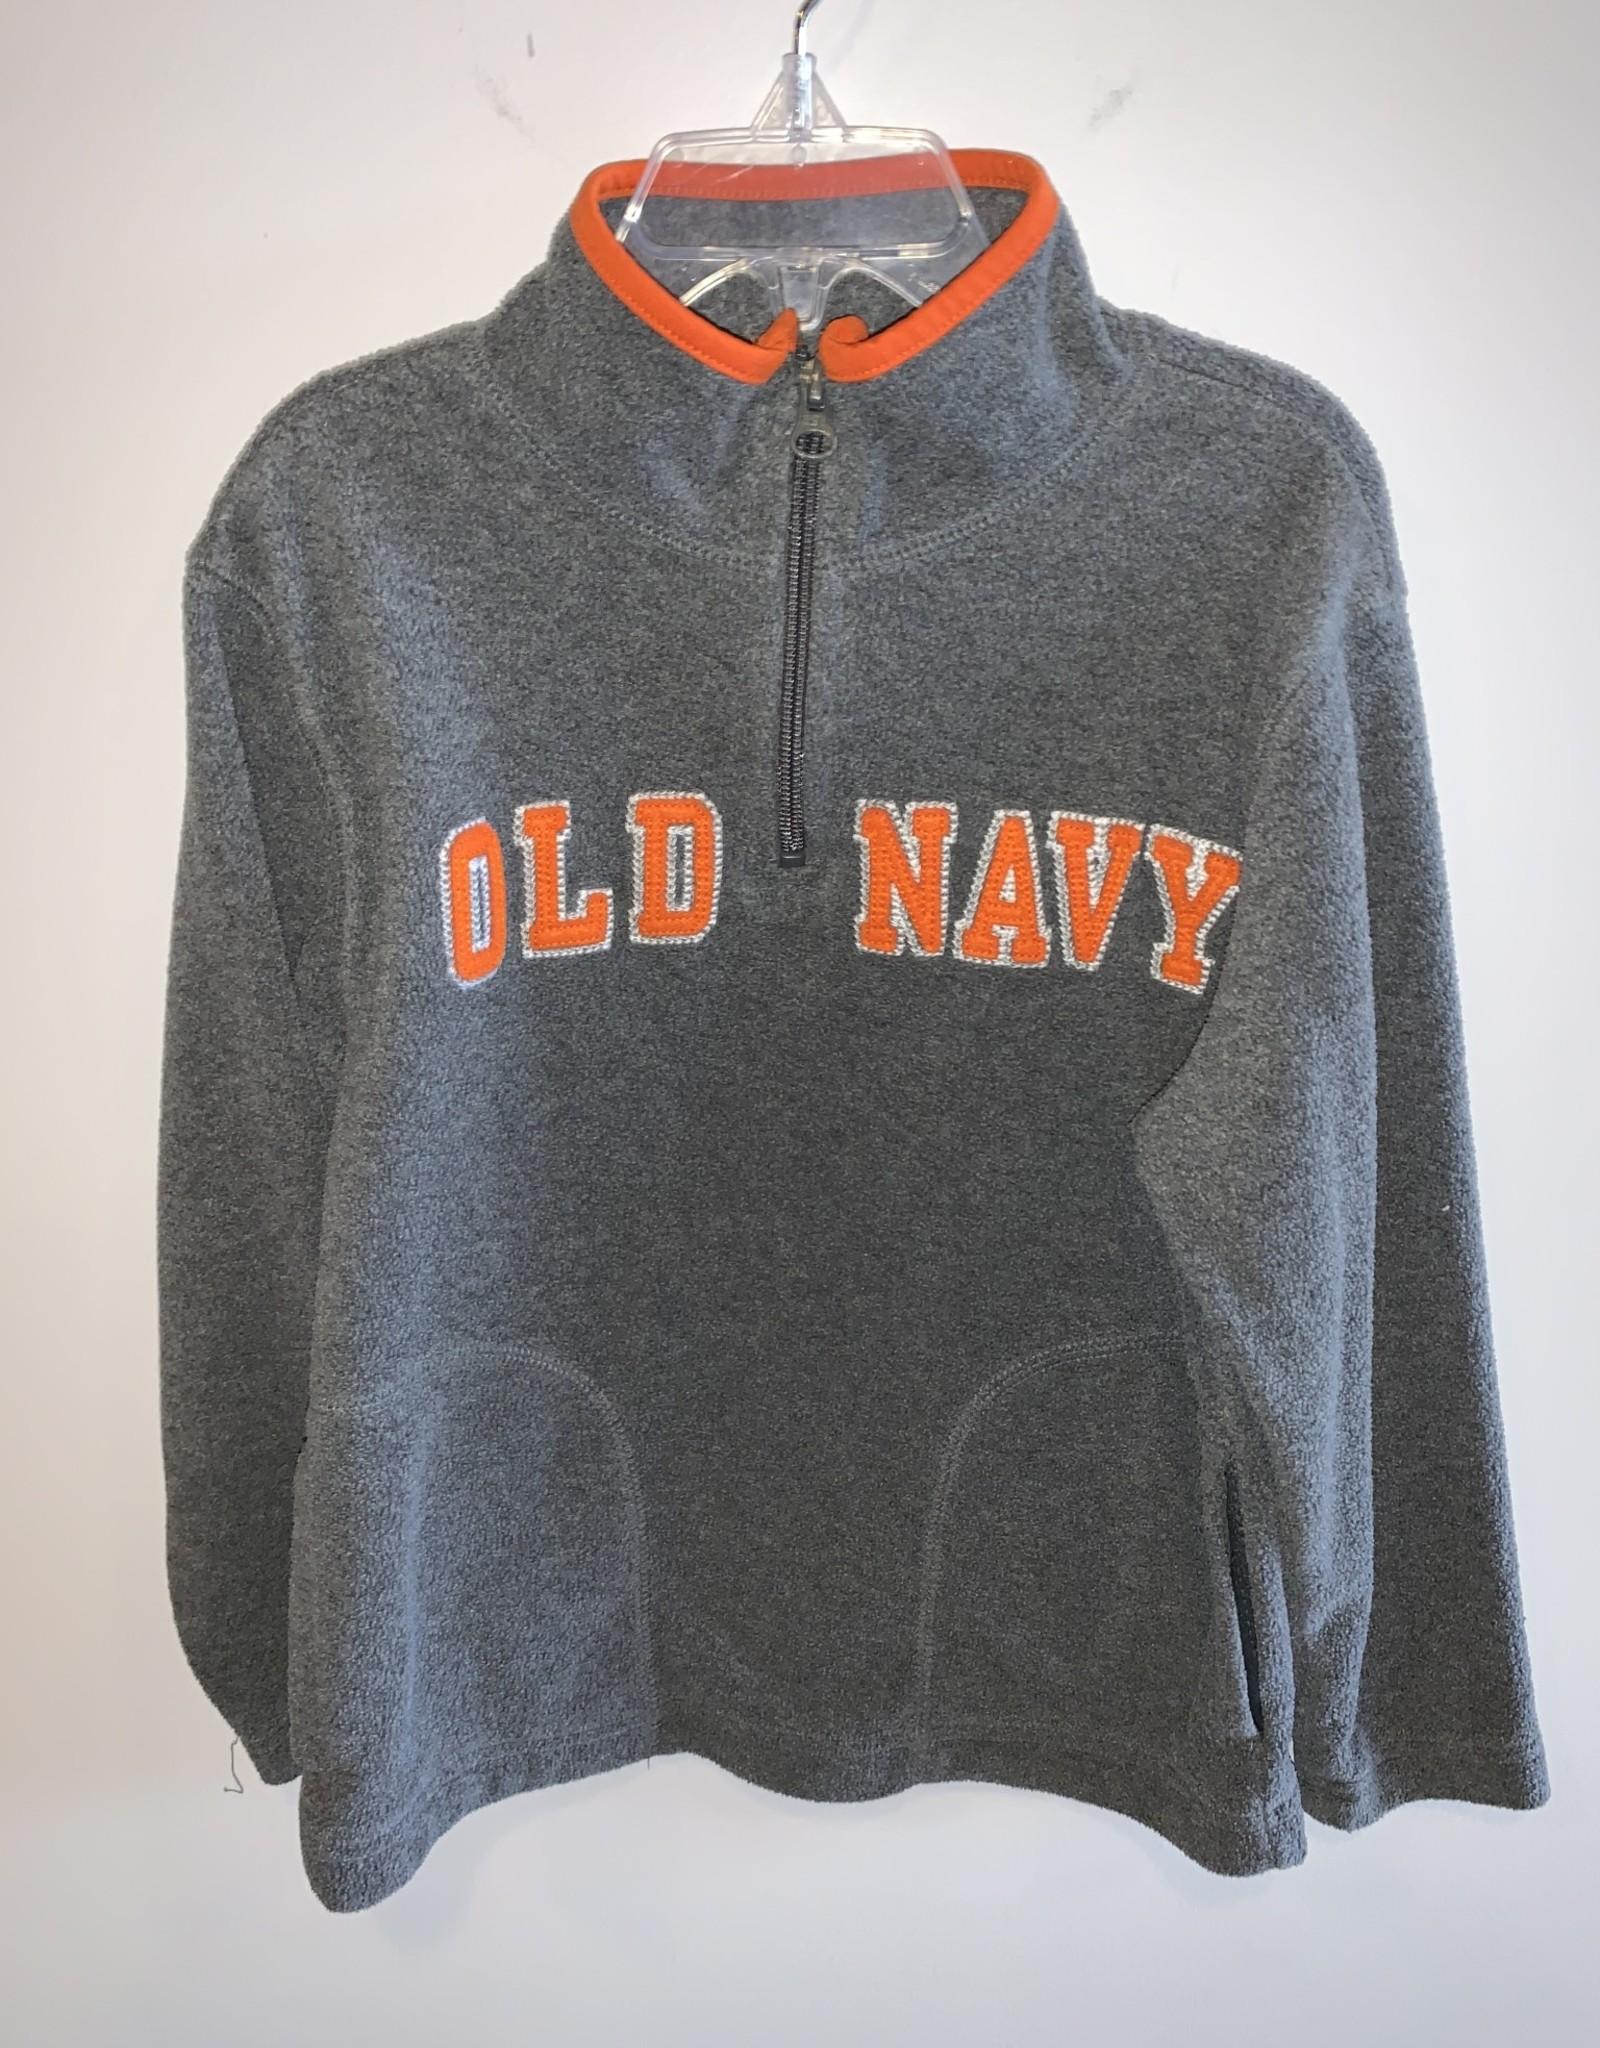 Old Navy Boys/5T/OldNavy/Sweater